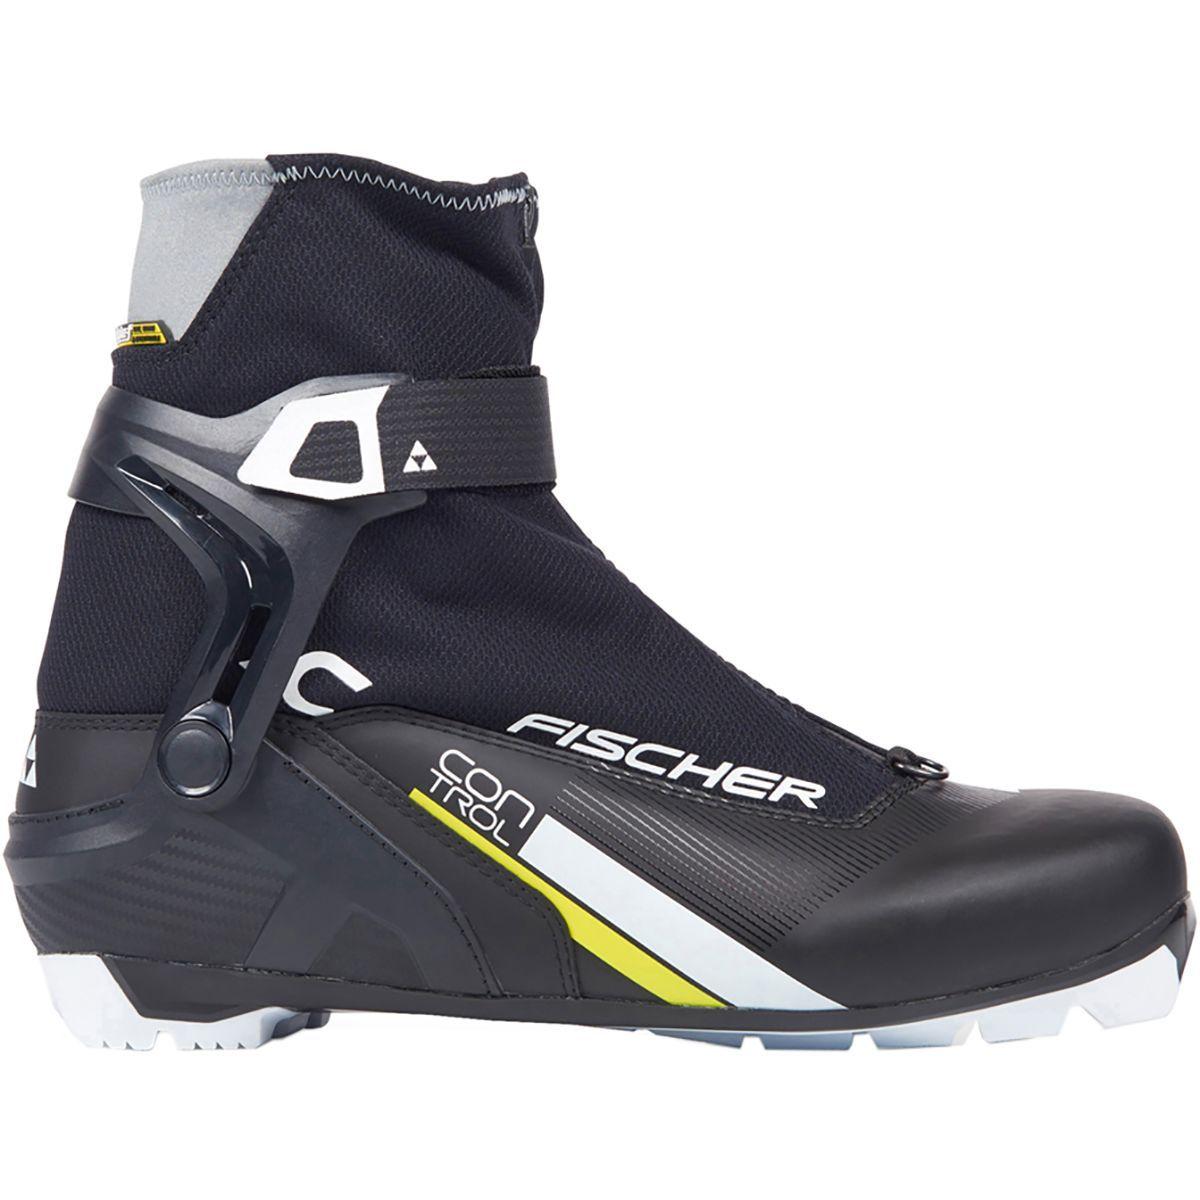 Fischer XC Control Skate Boot